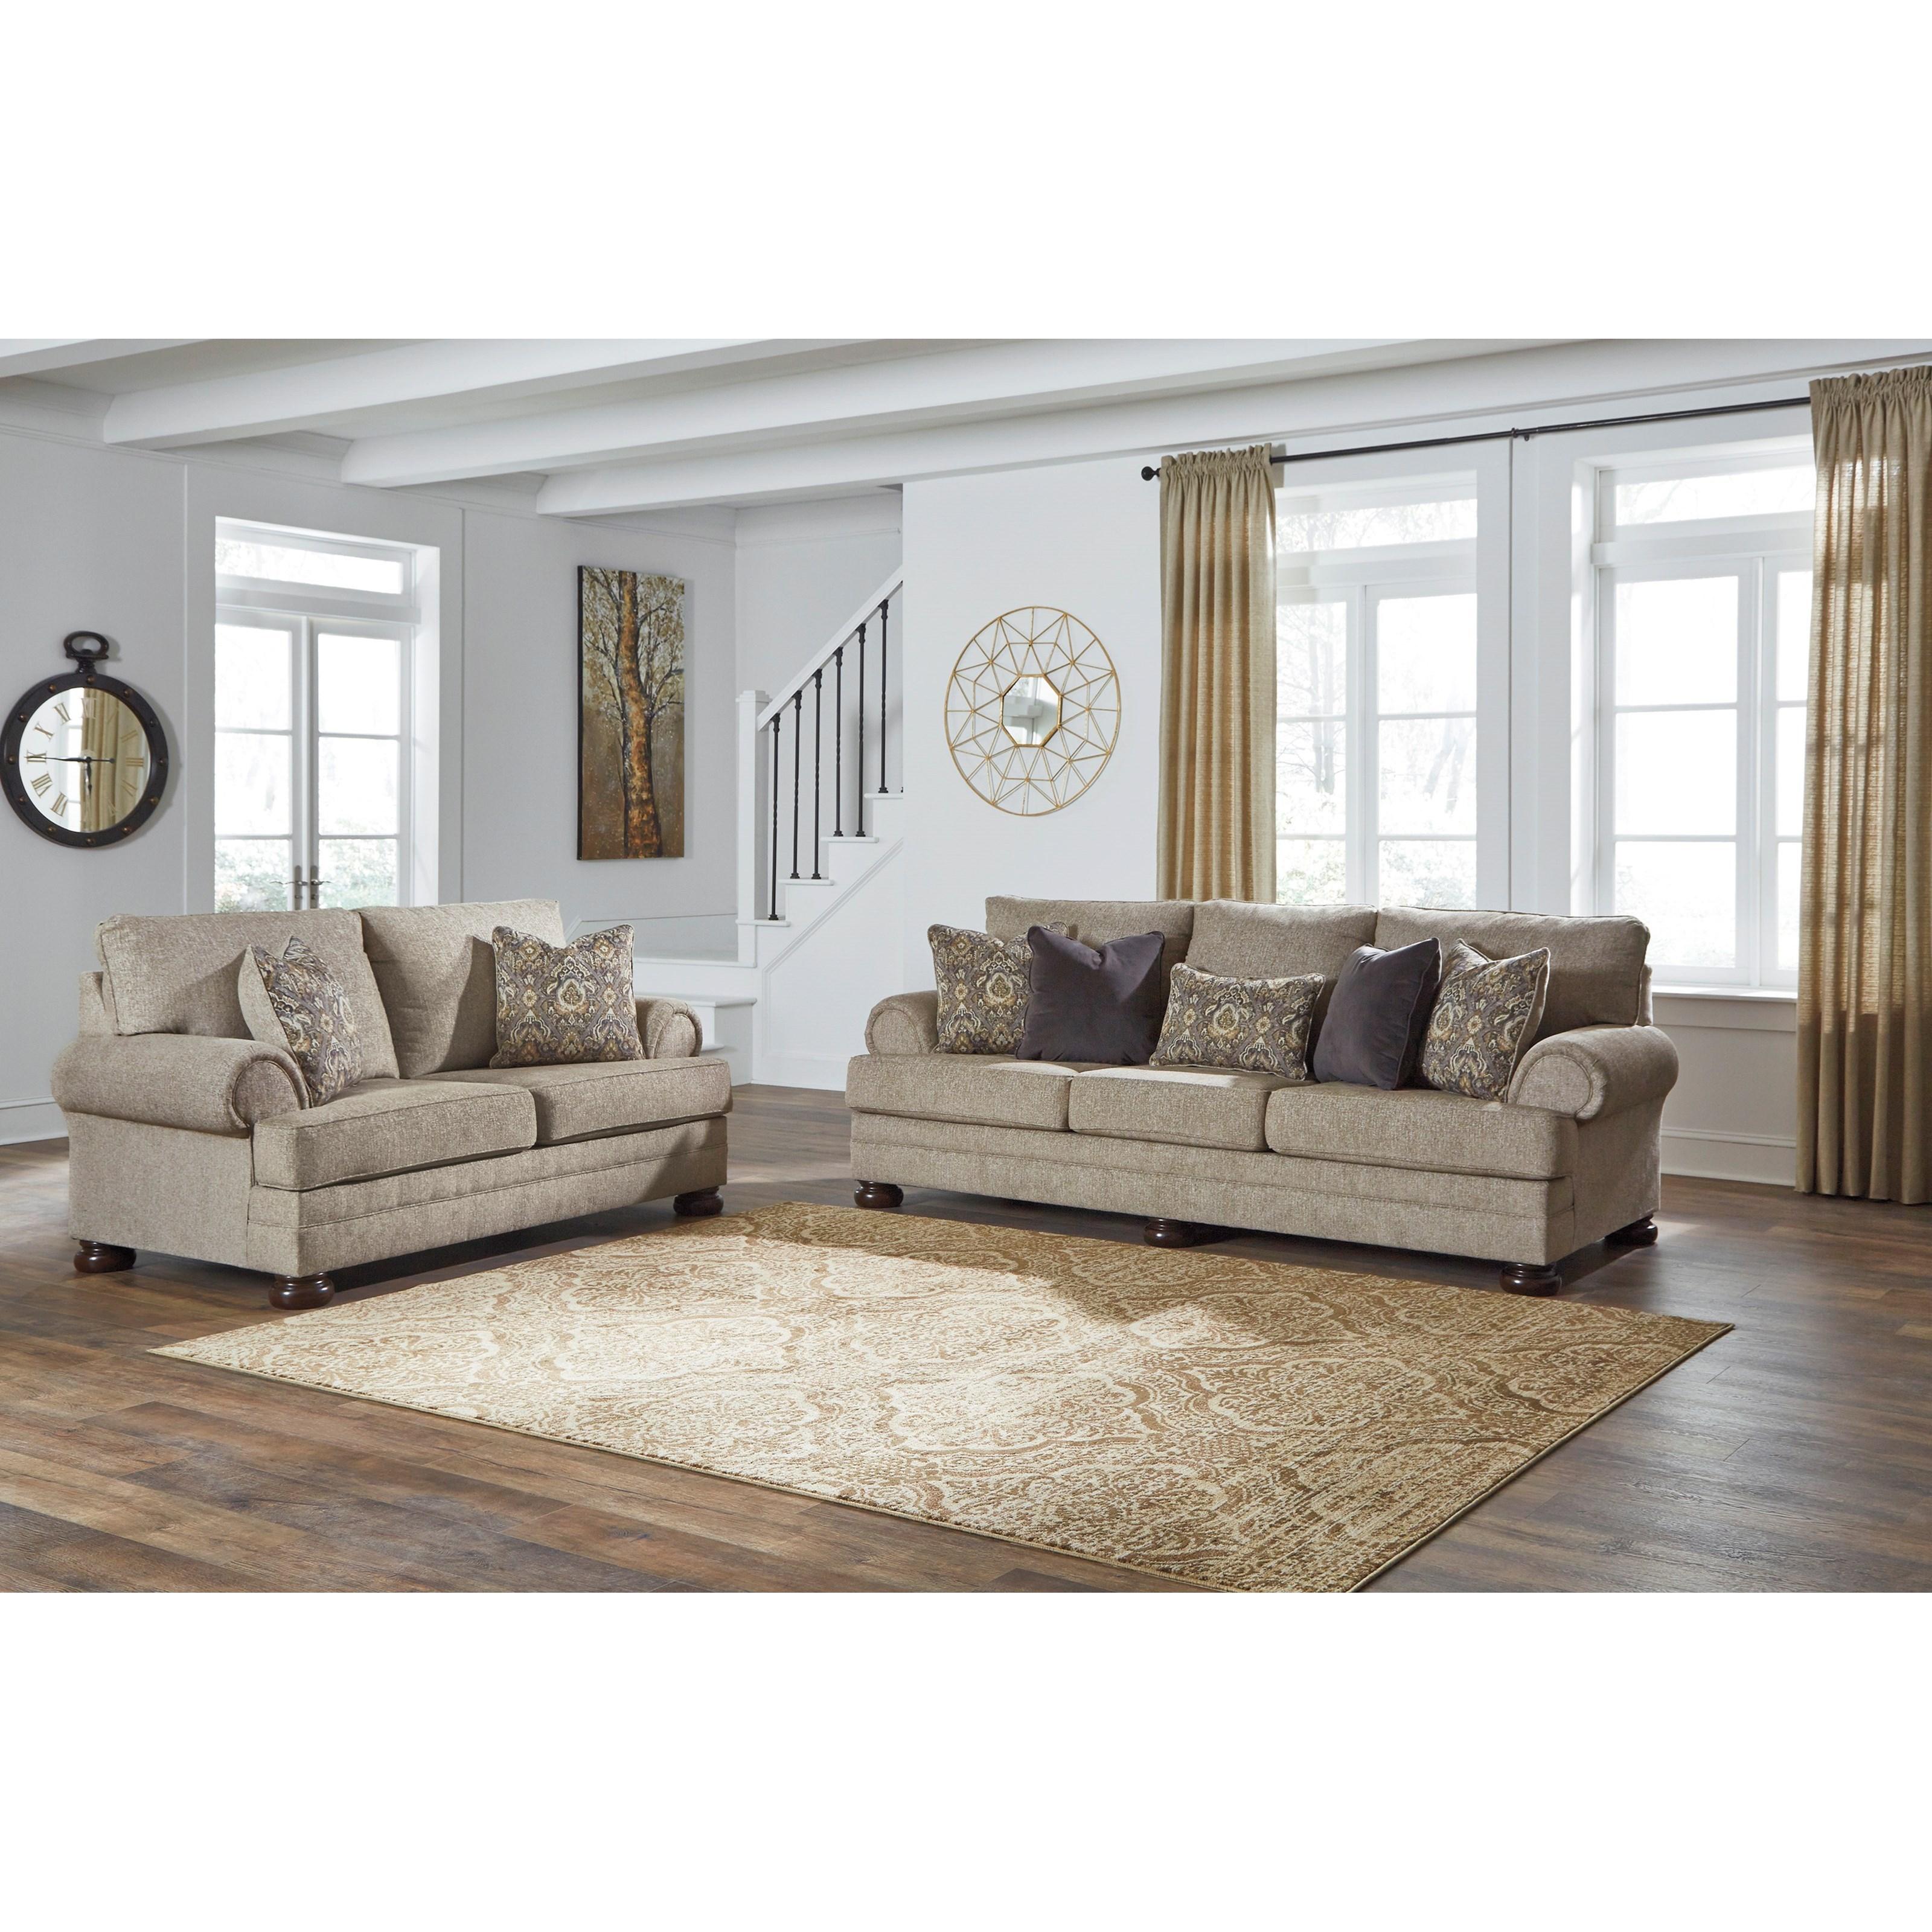 Kananwood Living Room Group by Ashley (Signature Design) at Johnny Janosik